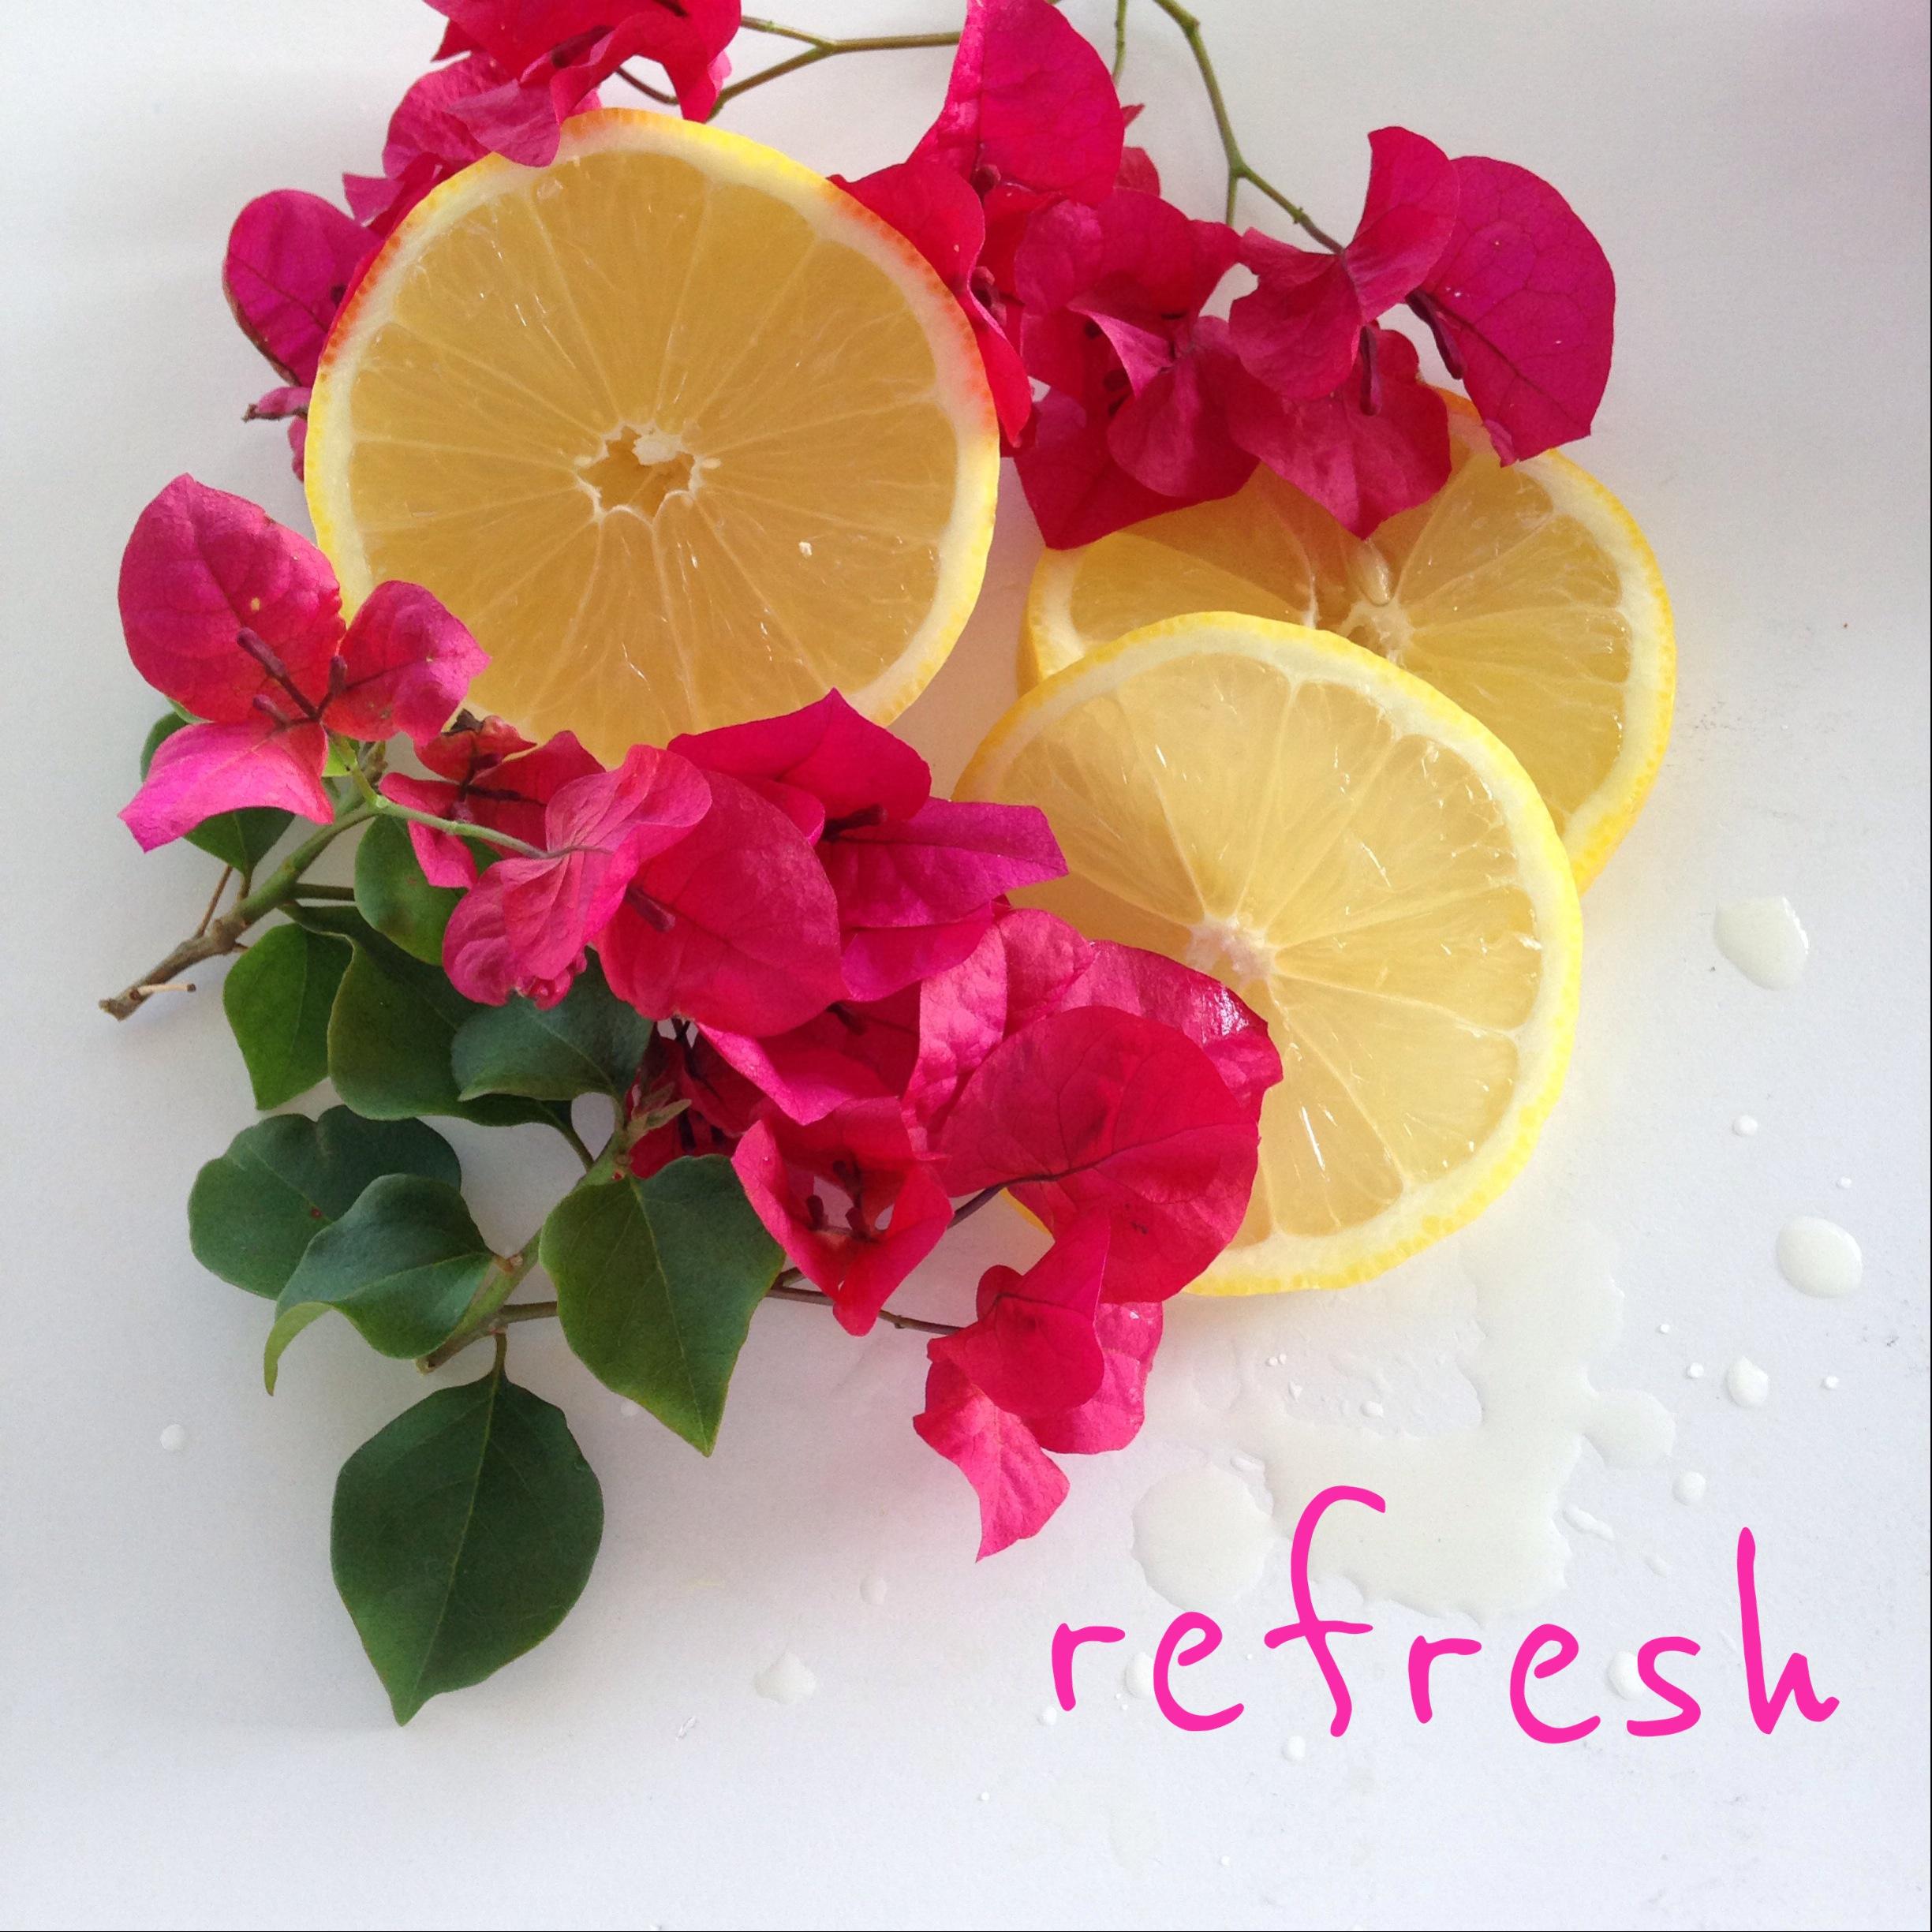 Susan Shepardson   - Lemons are so  Refresh ing...just the scent of a fresh cut lemon, elevates my mood. I should smell lemons more often! : )